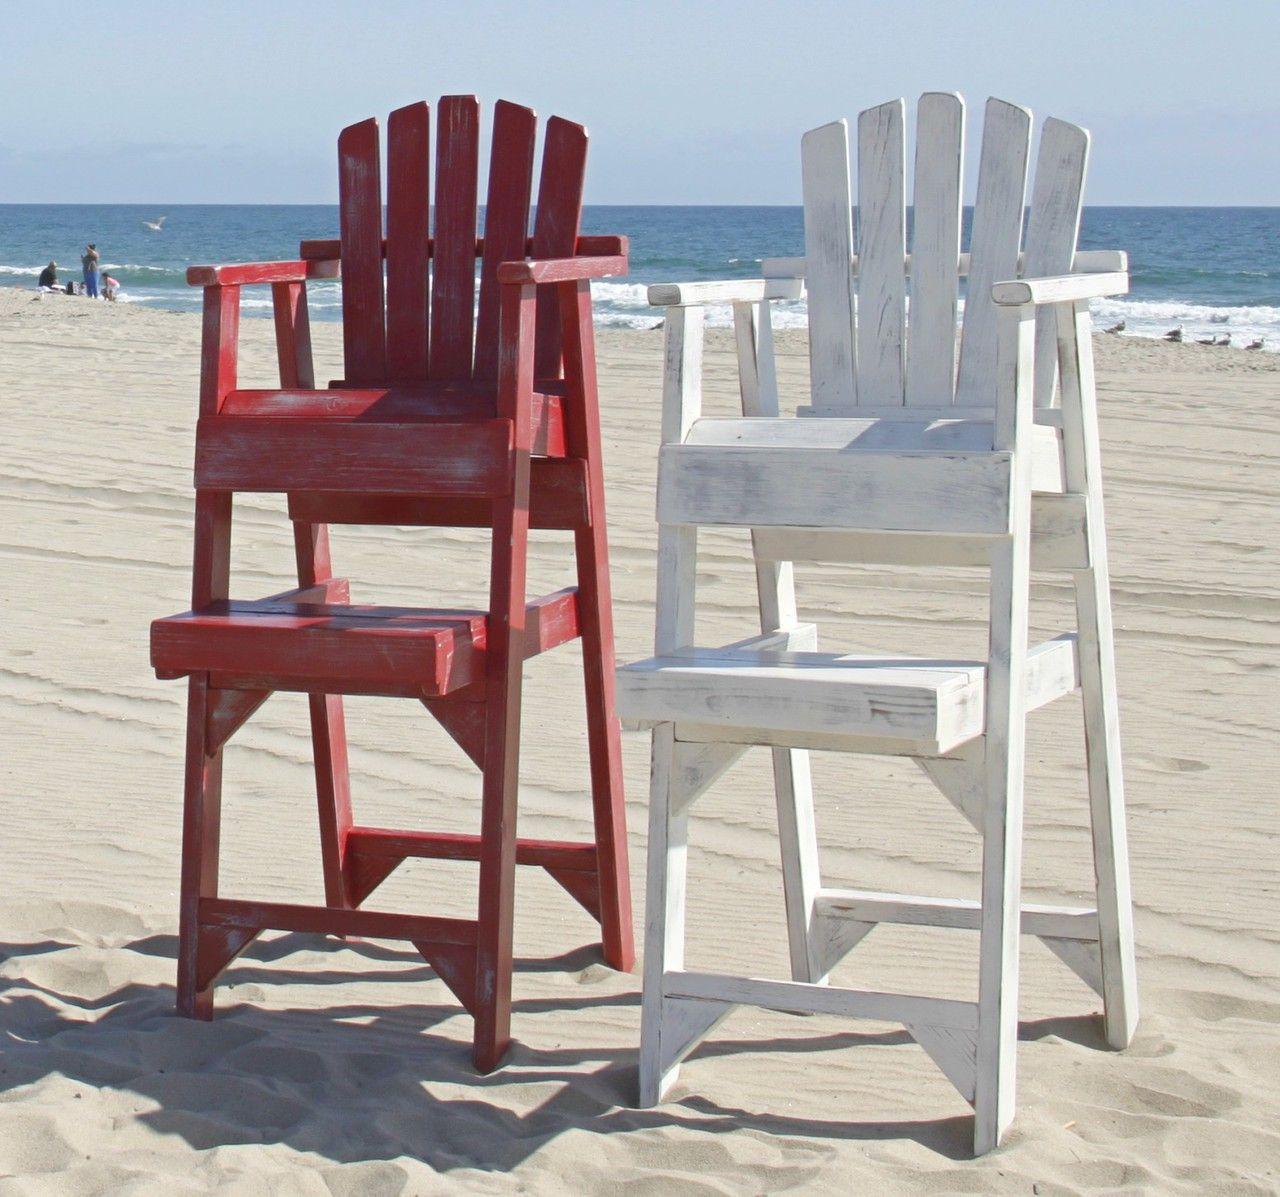 Tumbleweed and Dandelion - Lifeguard Chair, $550.00 (http ...